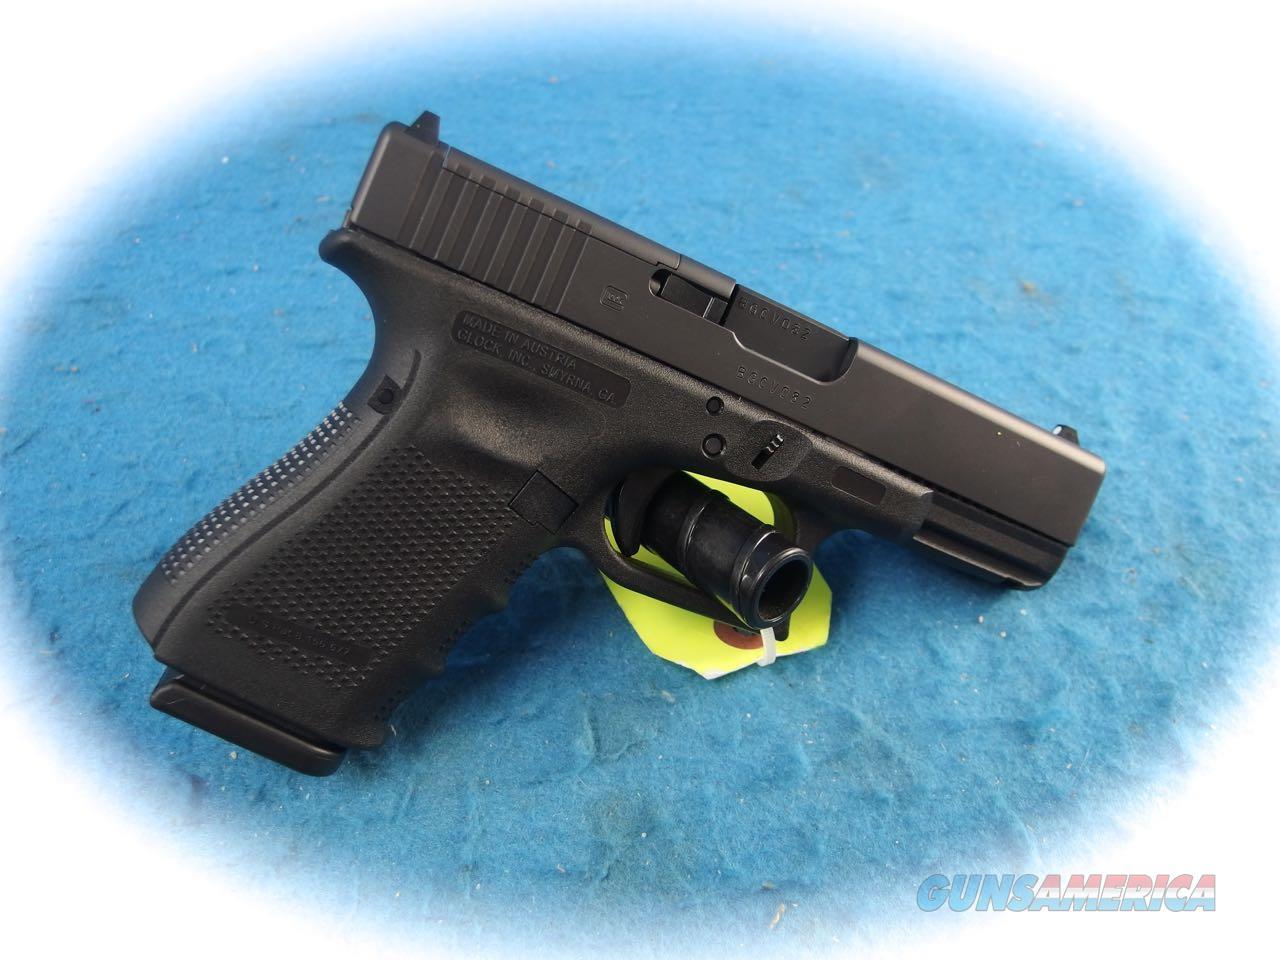 Glock Model 19 MOS Gen 4 9mm Semi Auto Pistol **New**  Guns > Pistols > Glock Pistols > 19